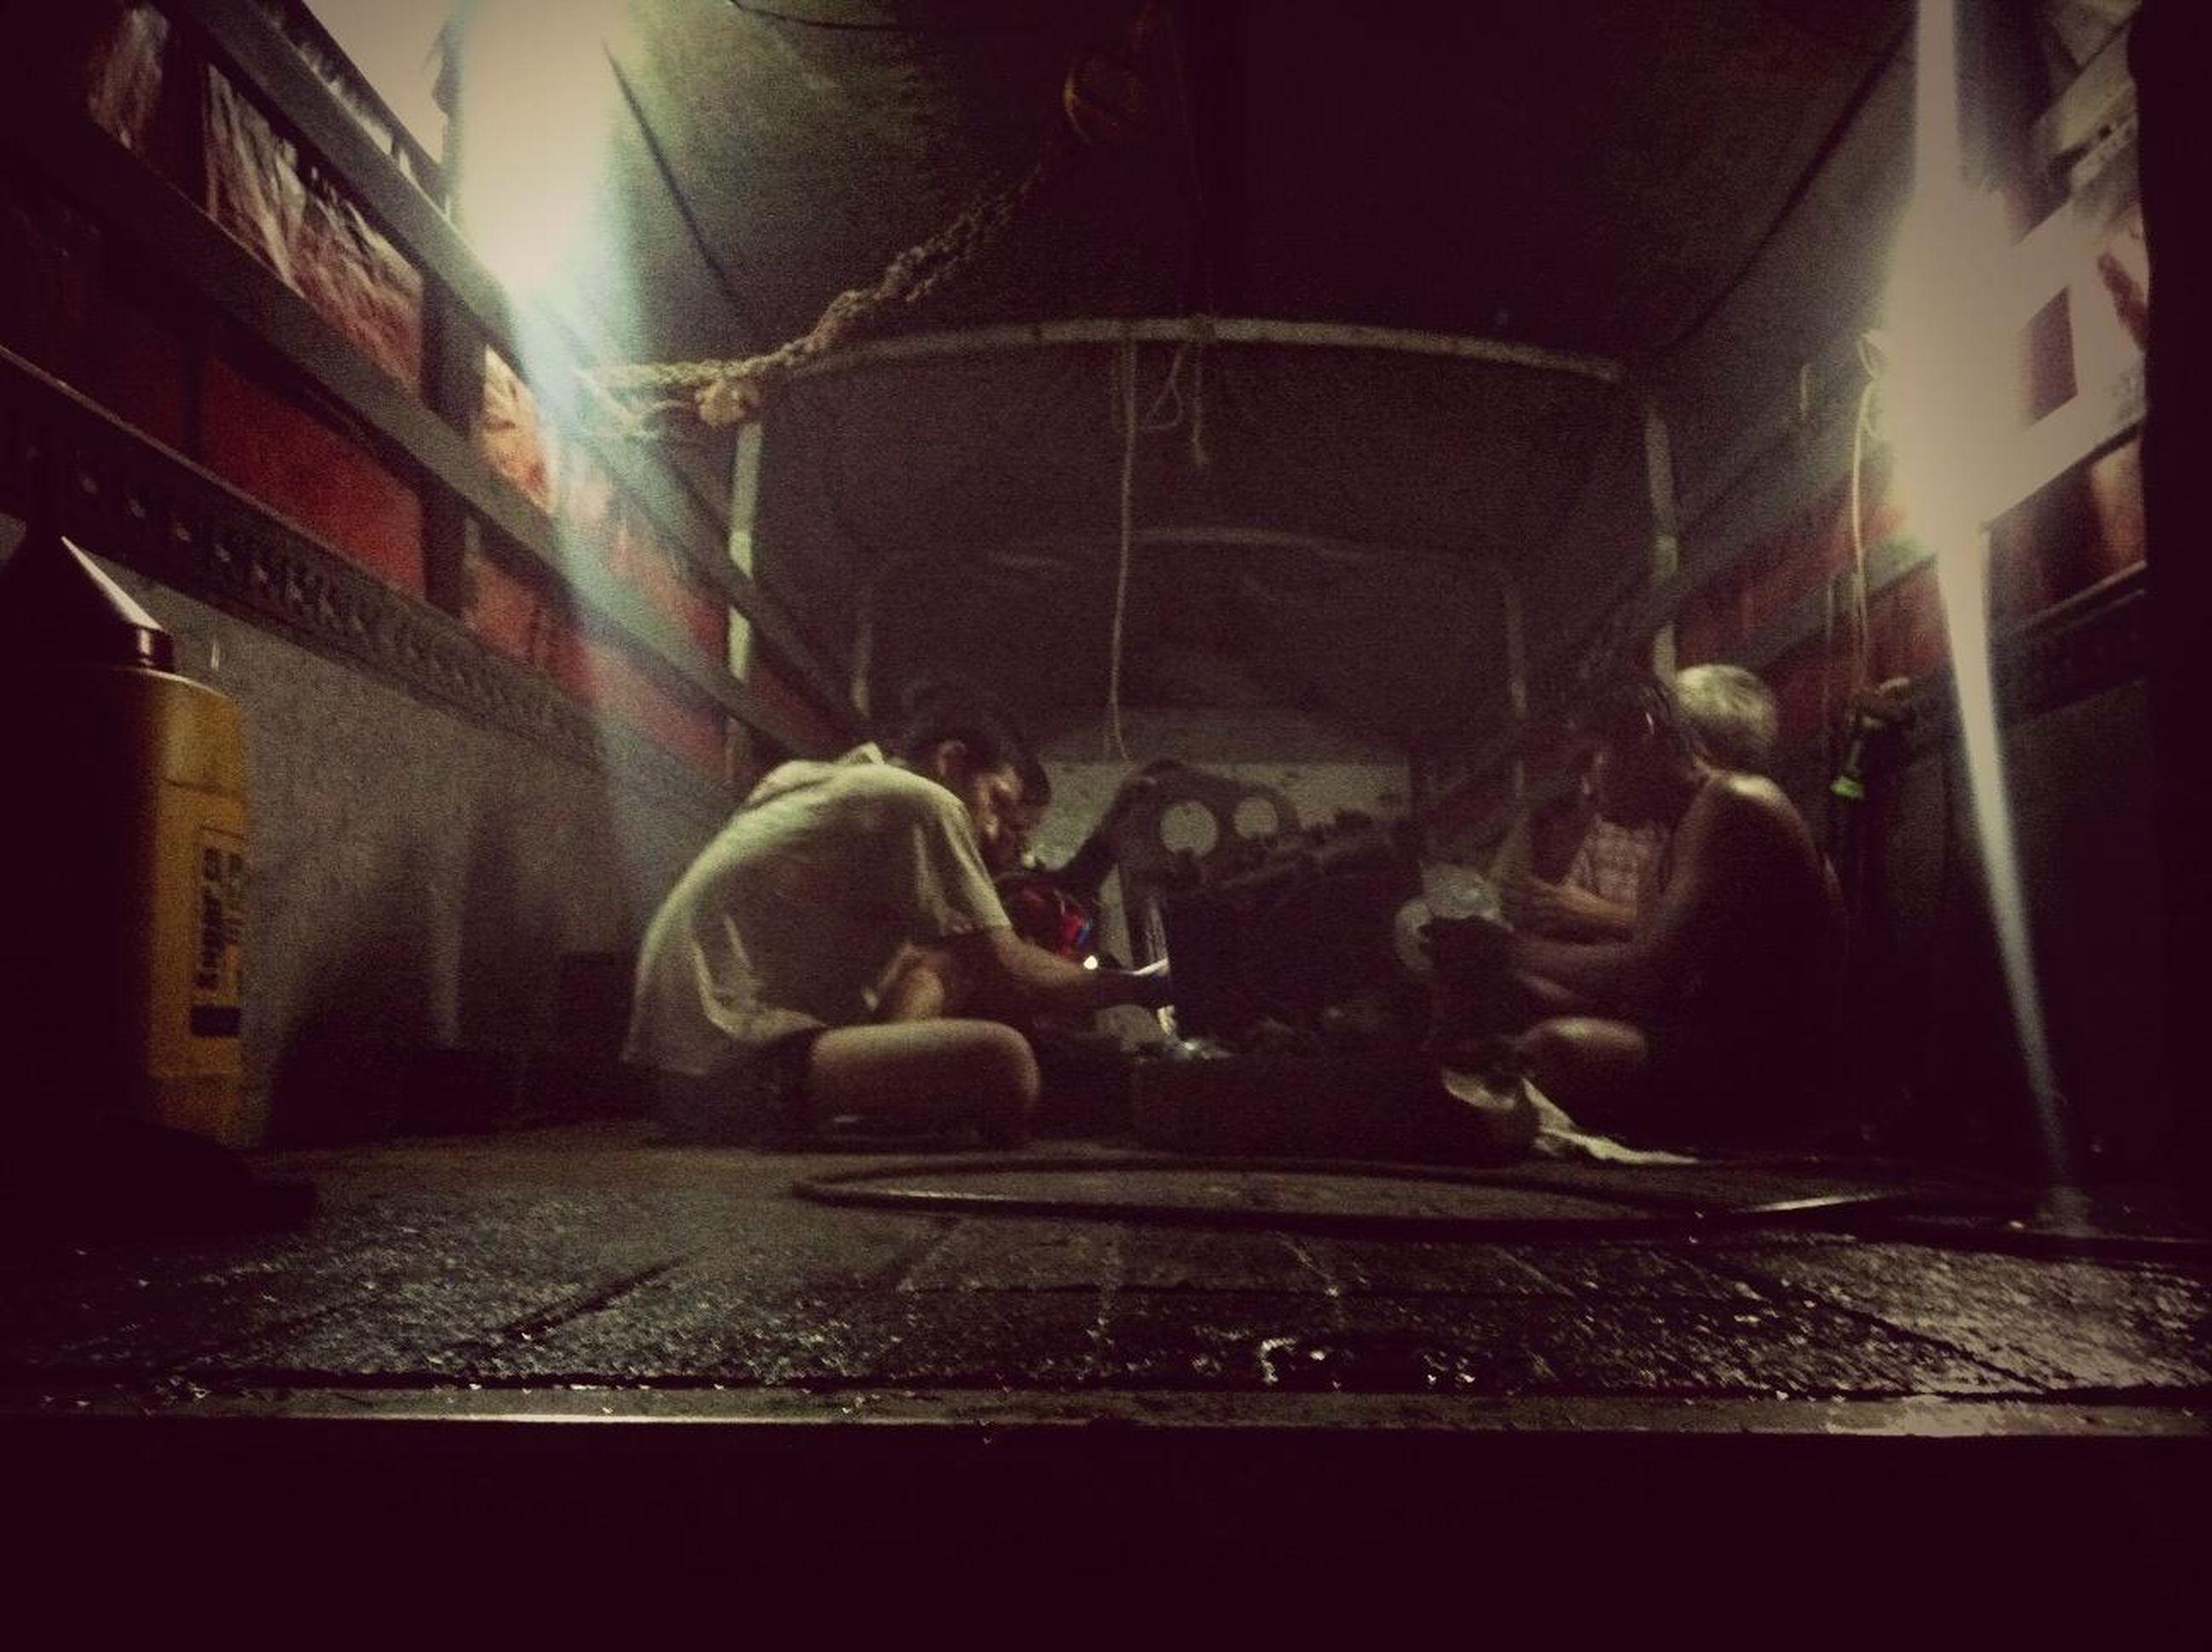 illuminated, night, indoors, architecture, built structure, building exterior, light - natural phenomenon, lighting equipment, wall - building feature, window, street, transportation, building, art, no people, art and craft, graffiti, land vehicle, dark, motion